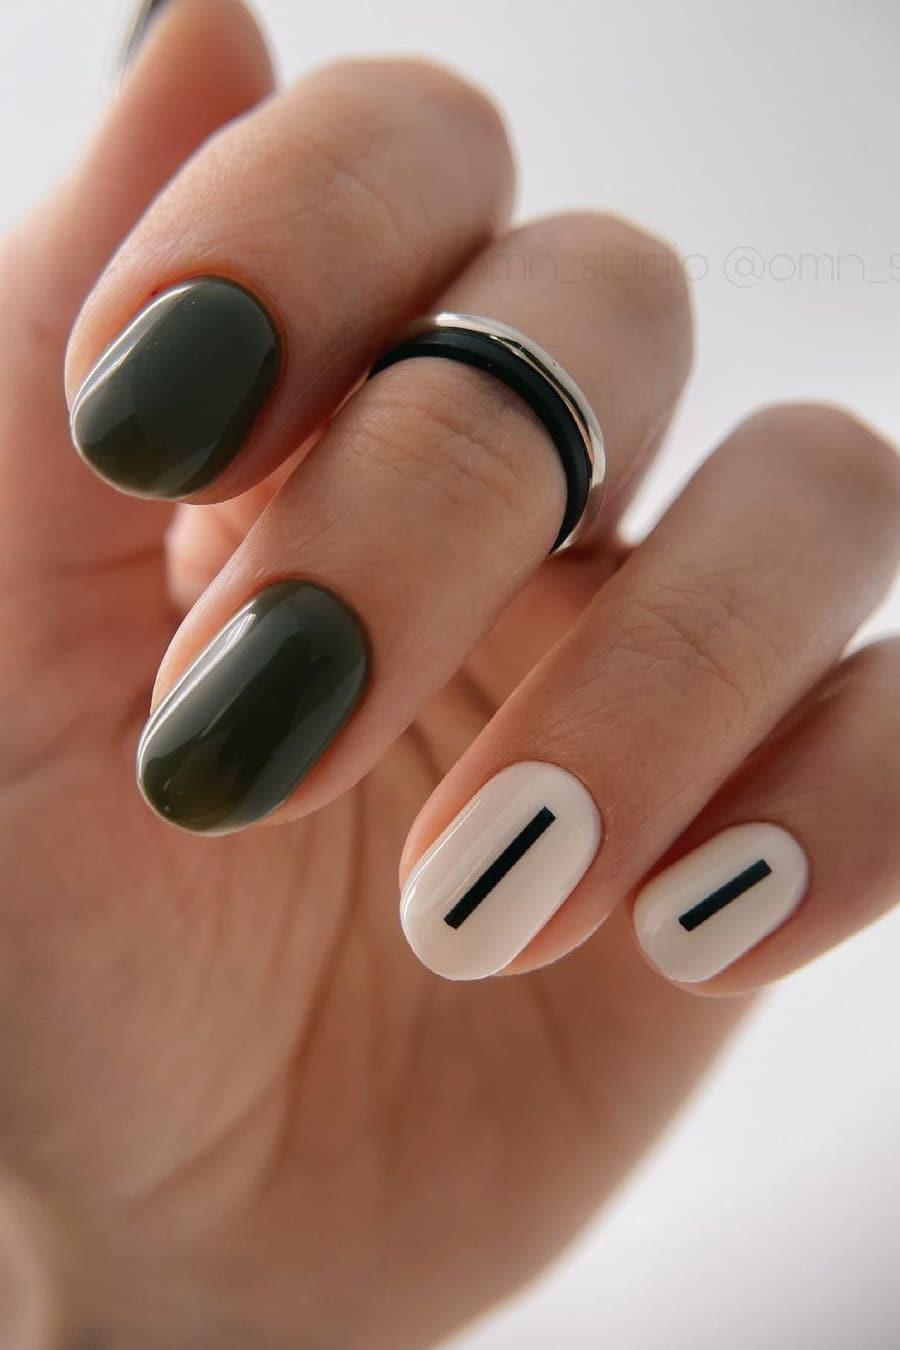 Minimalist black and white short nails